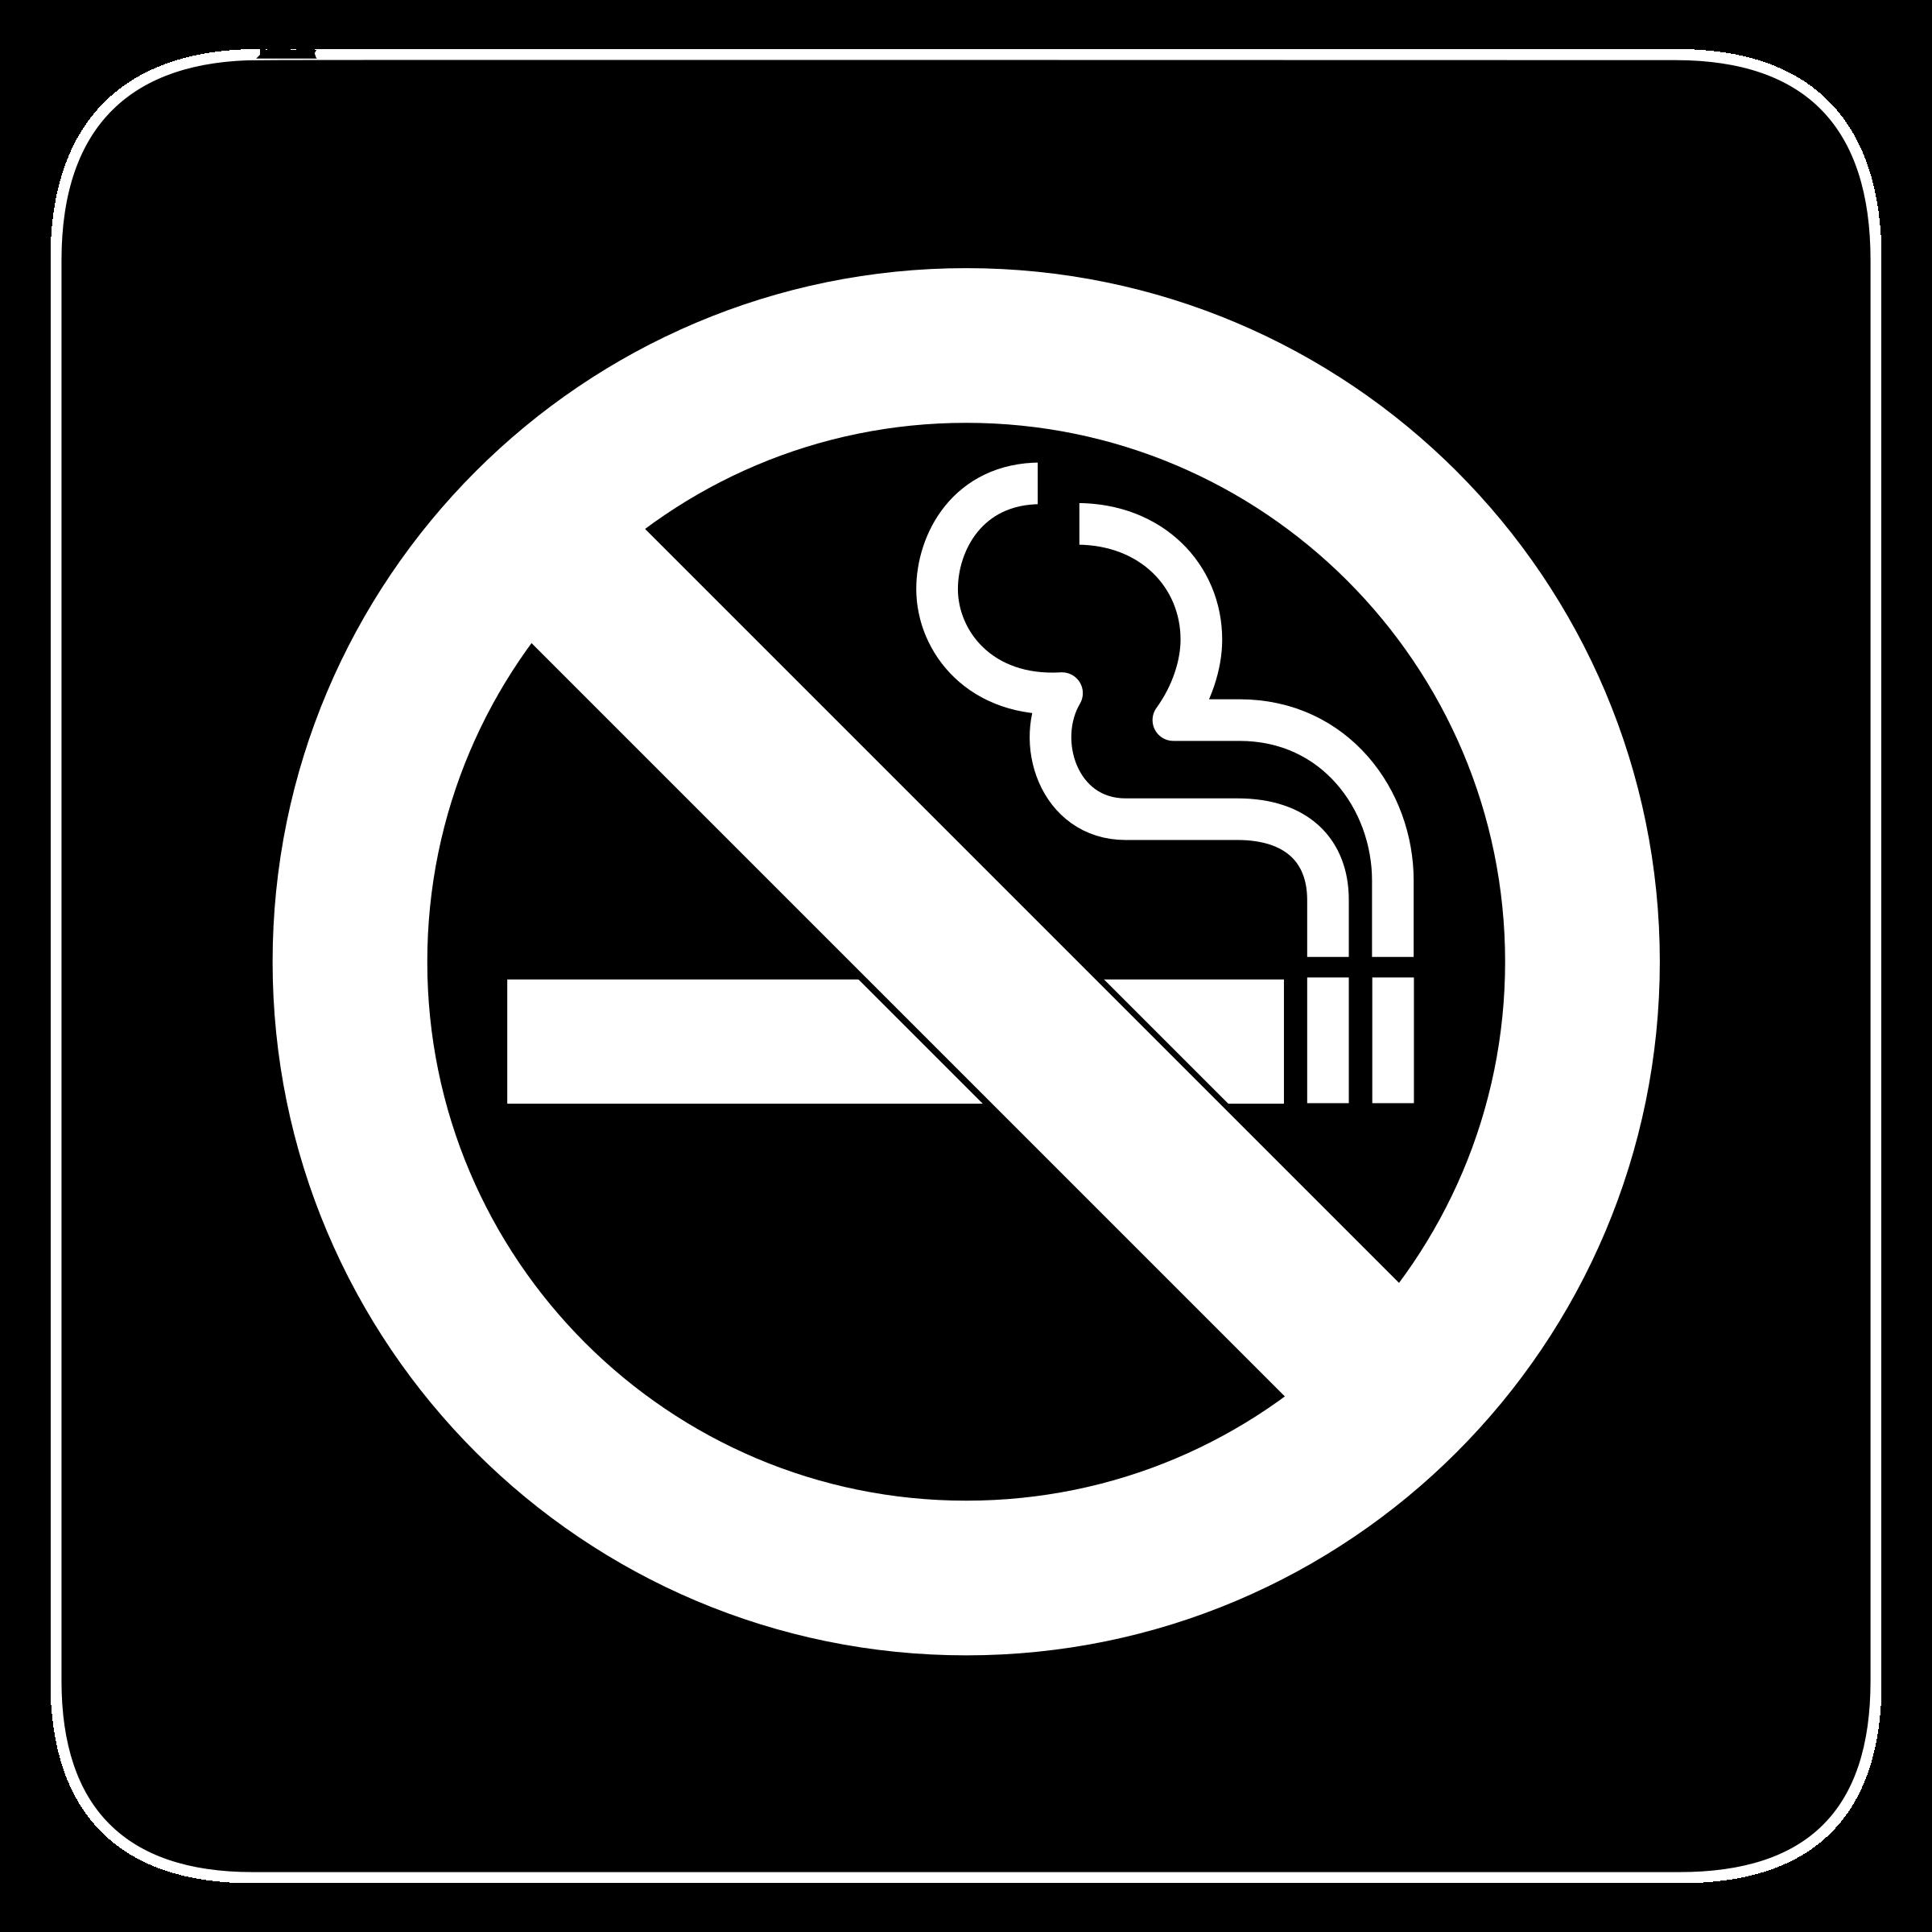 No Smoking clipart circle Aiga smoking smoking no bg